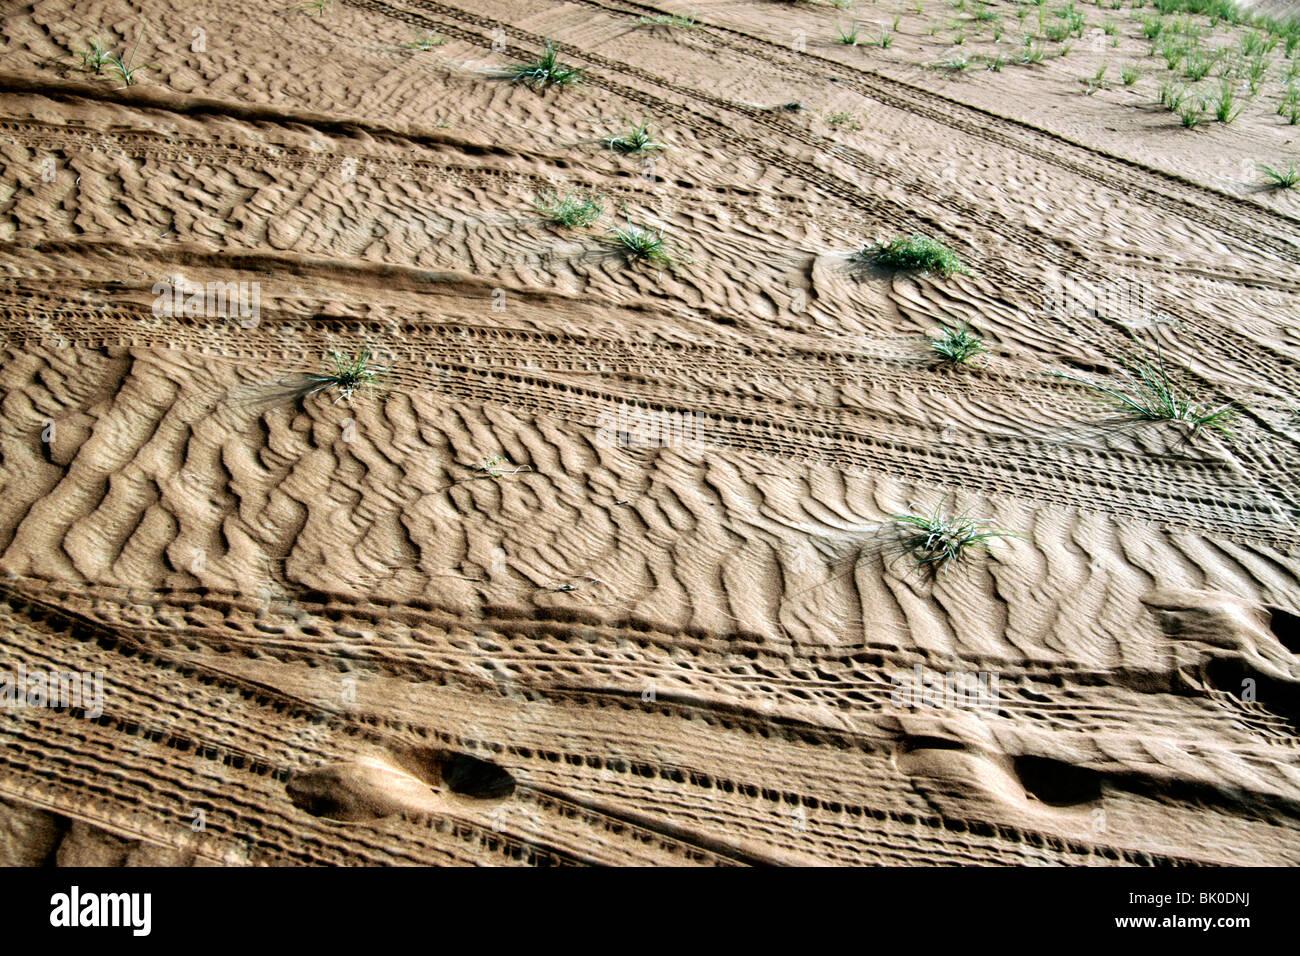 Tyre tracks in the desert in Dubai, UAE - Stock Image